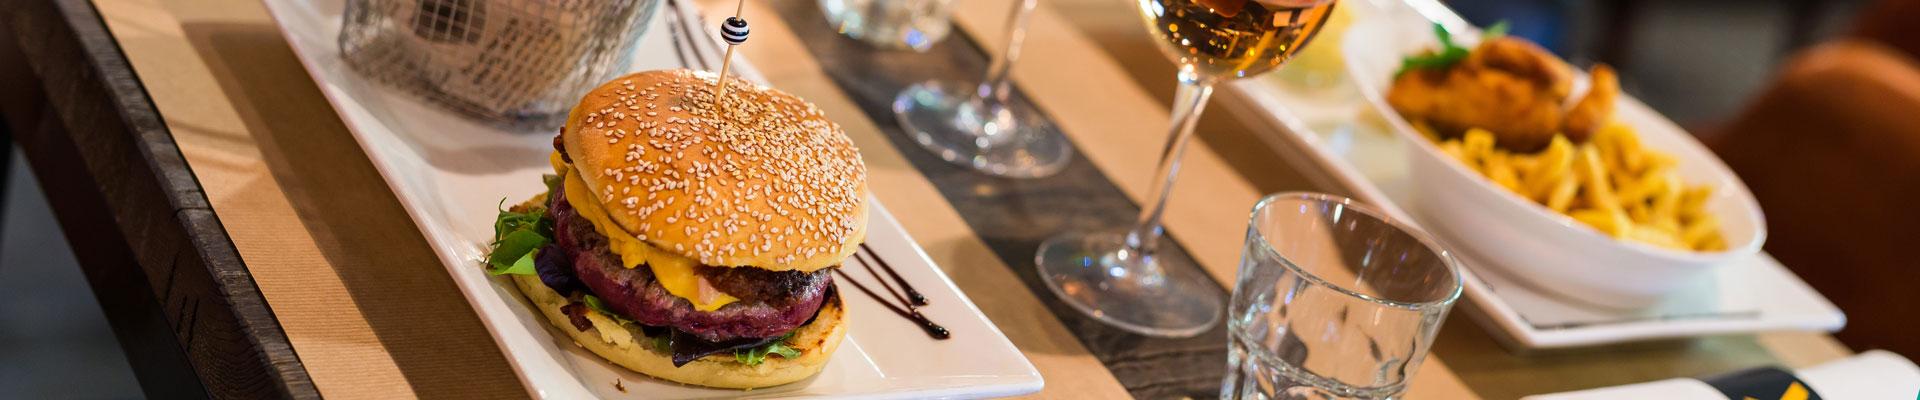 la-fabrik-steakhouse-food-&-drink-restaurant-bar-hangar-quai-rouen-seine-42-bandeau-burger-1920x400